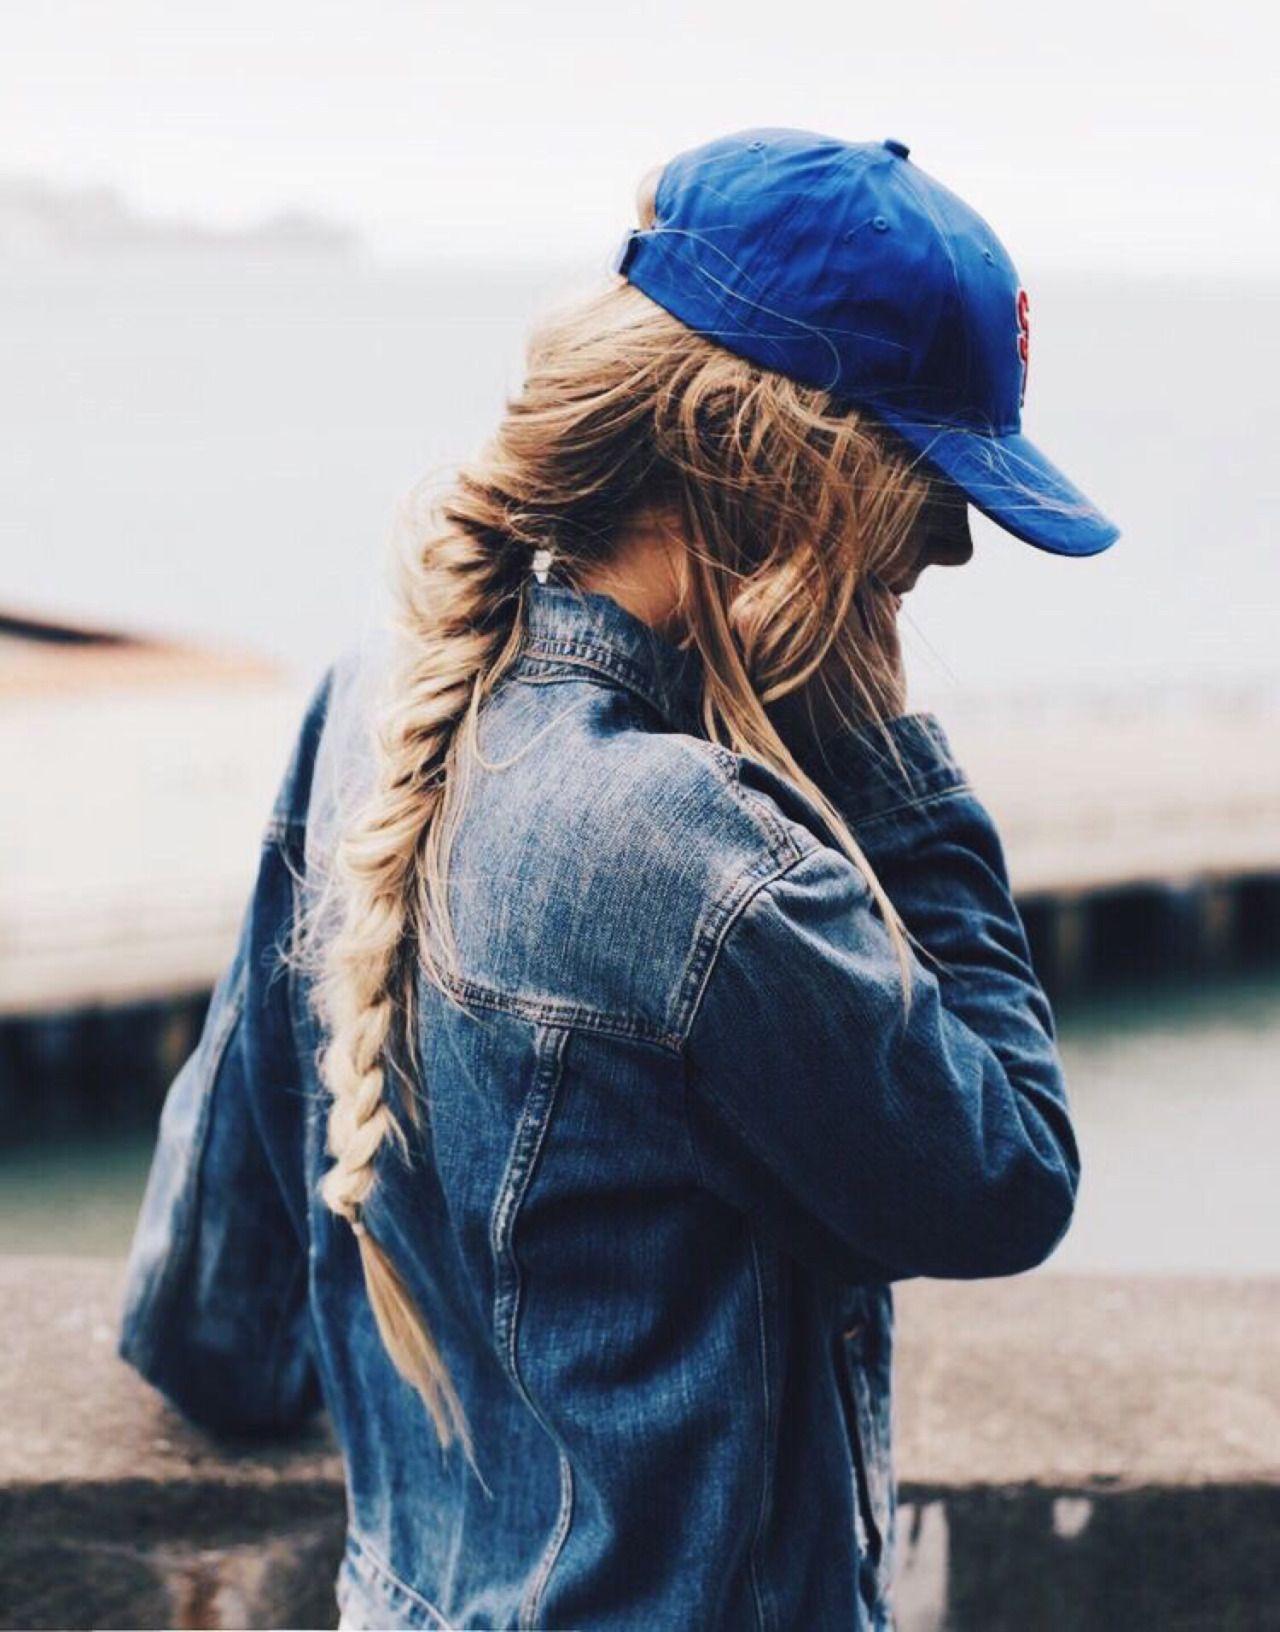 Denim Blues Messy Hair Hat